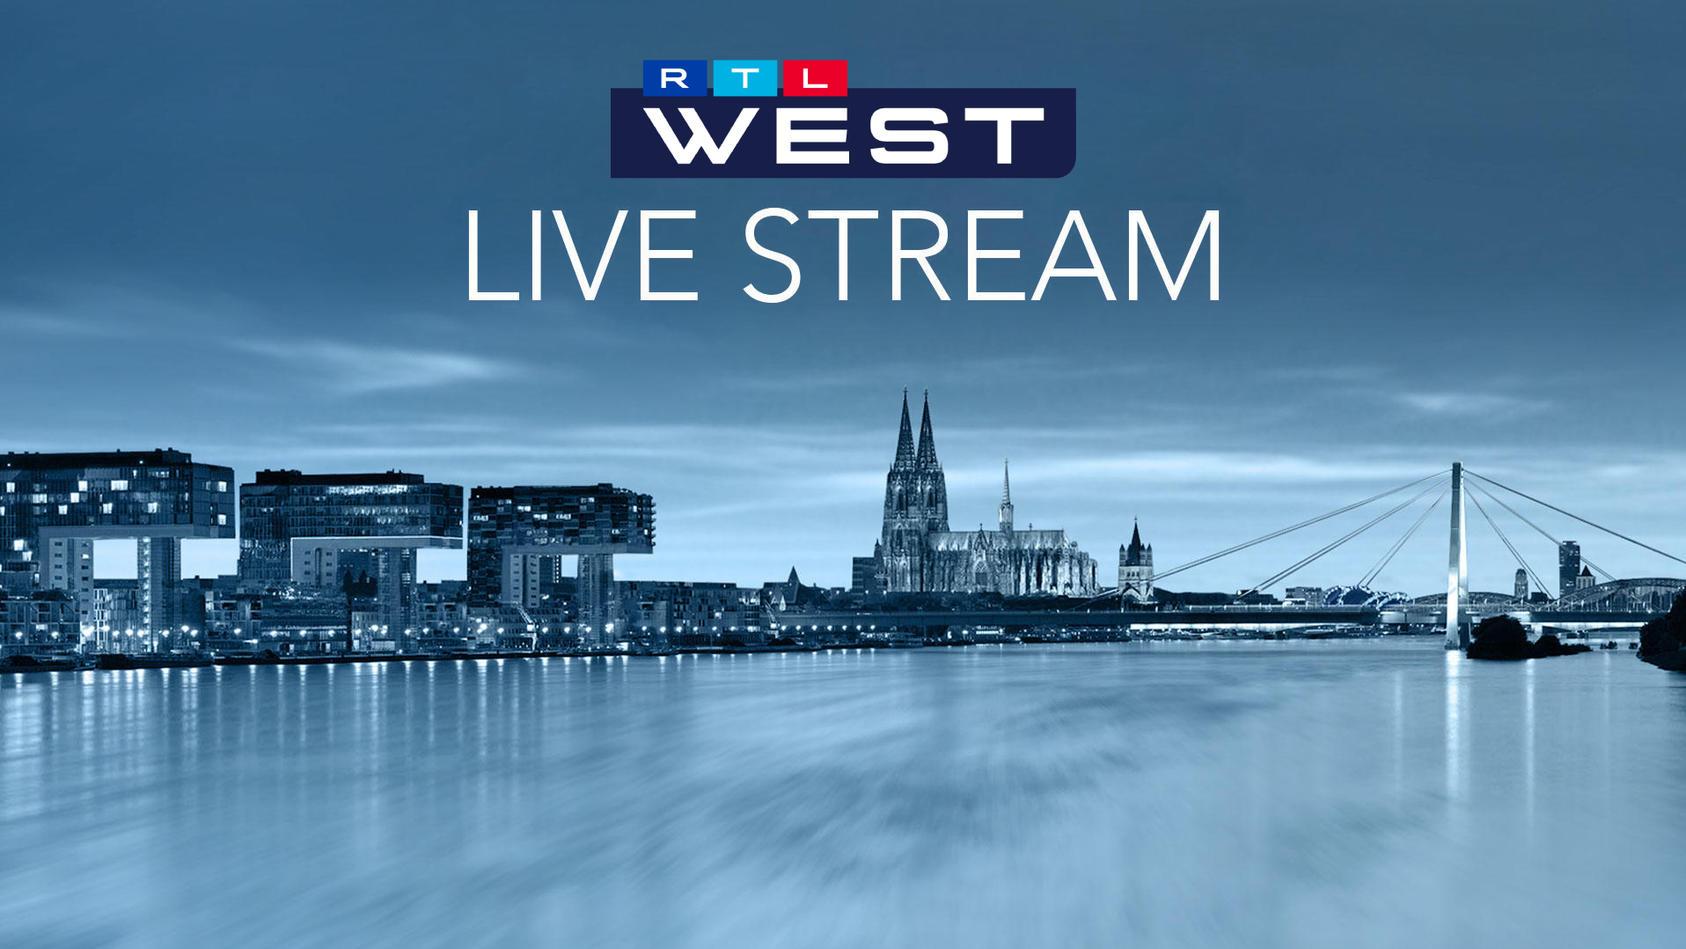 rtl-west-im-livestream